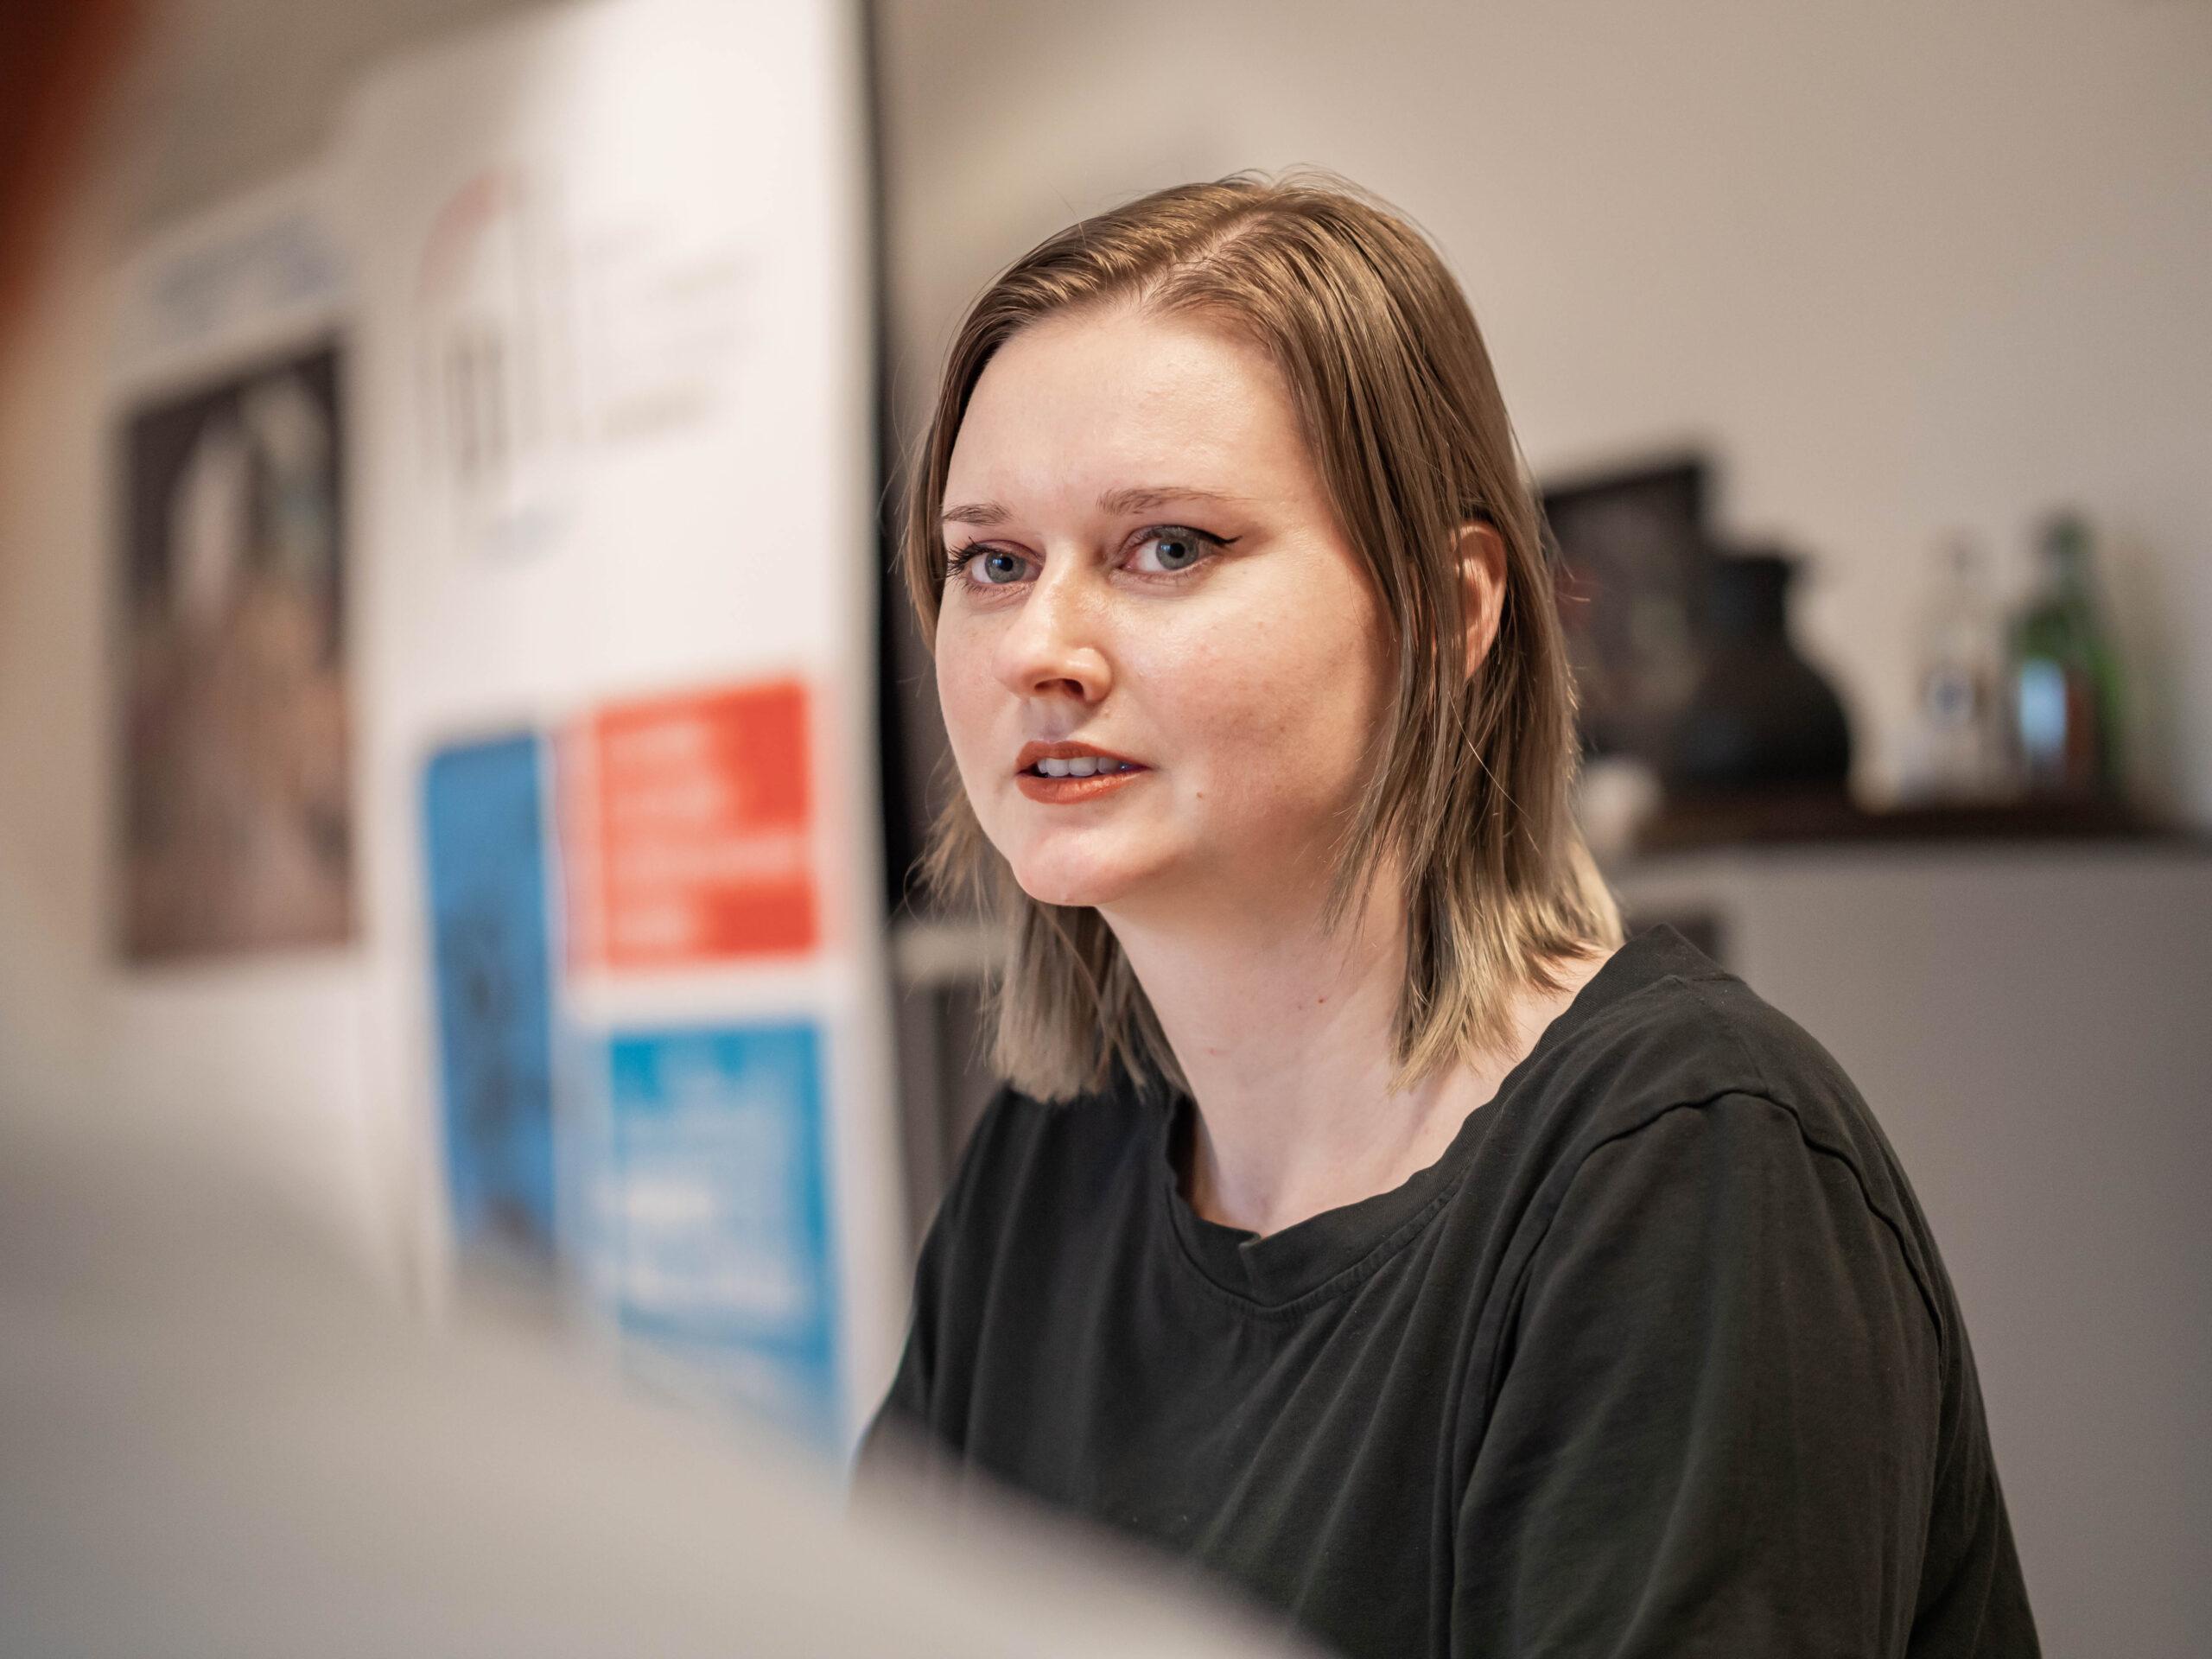 Natalia                                                    Slioutova                                                    - Secrétaire de Direction